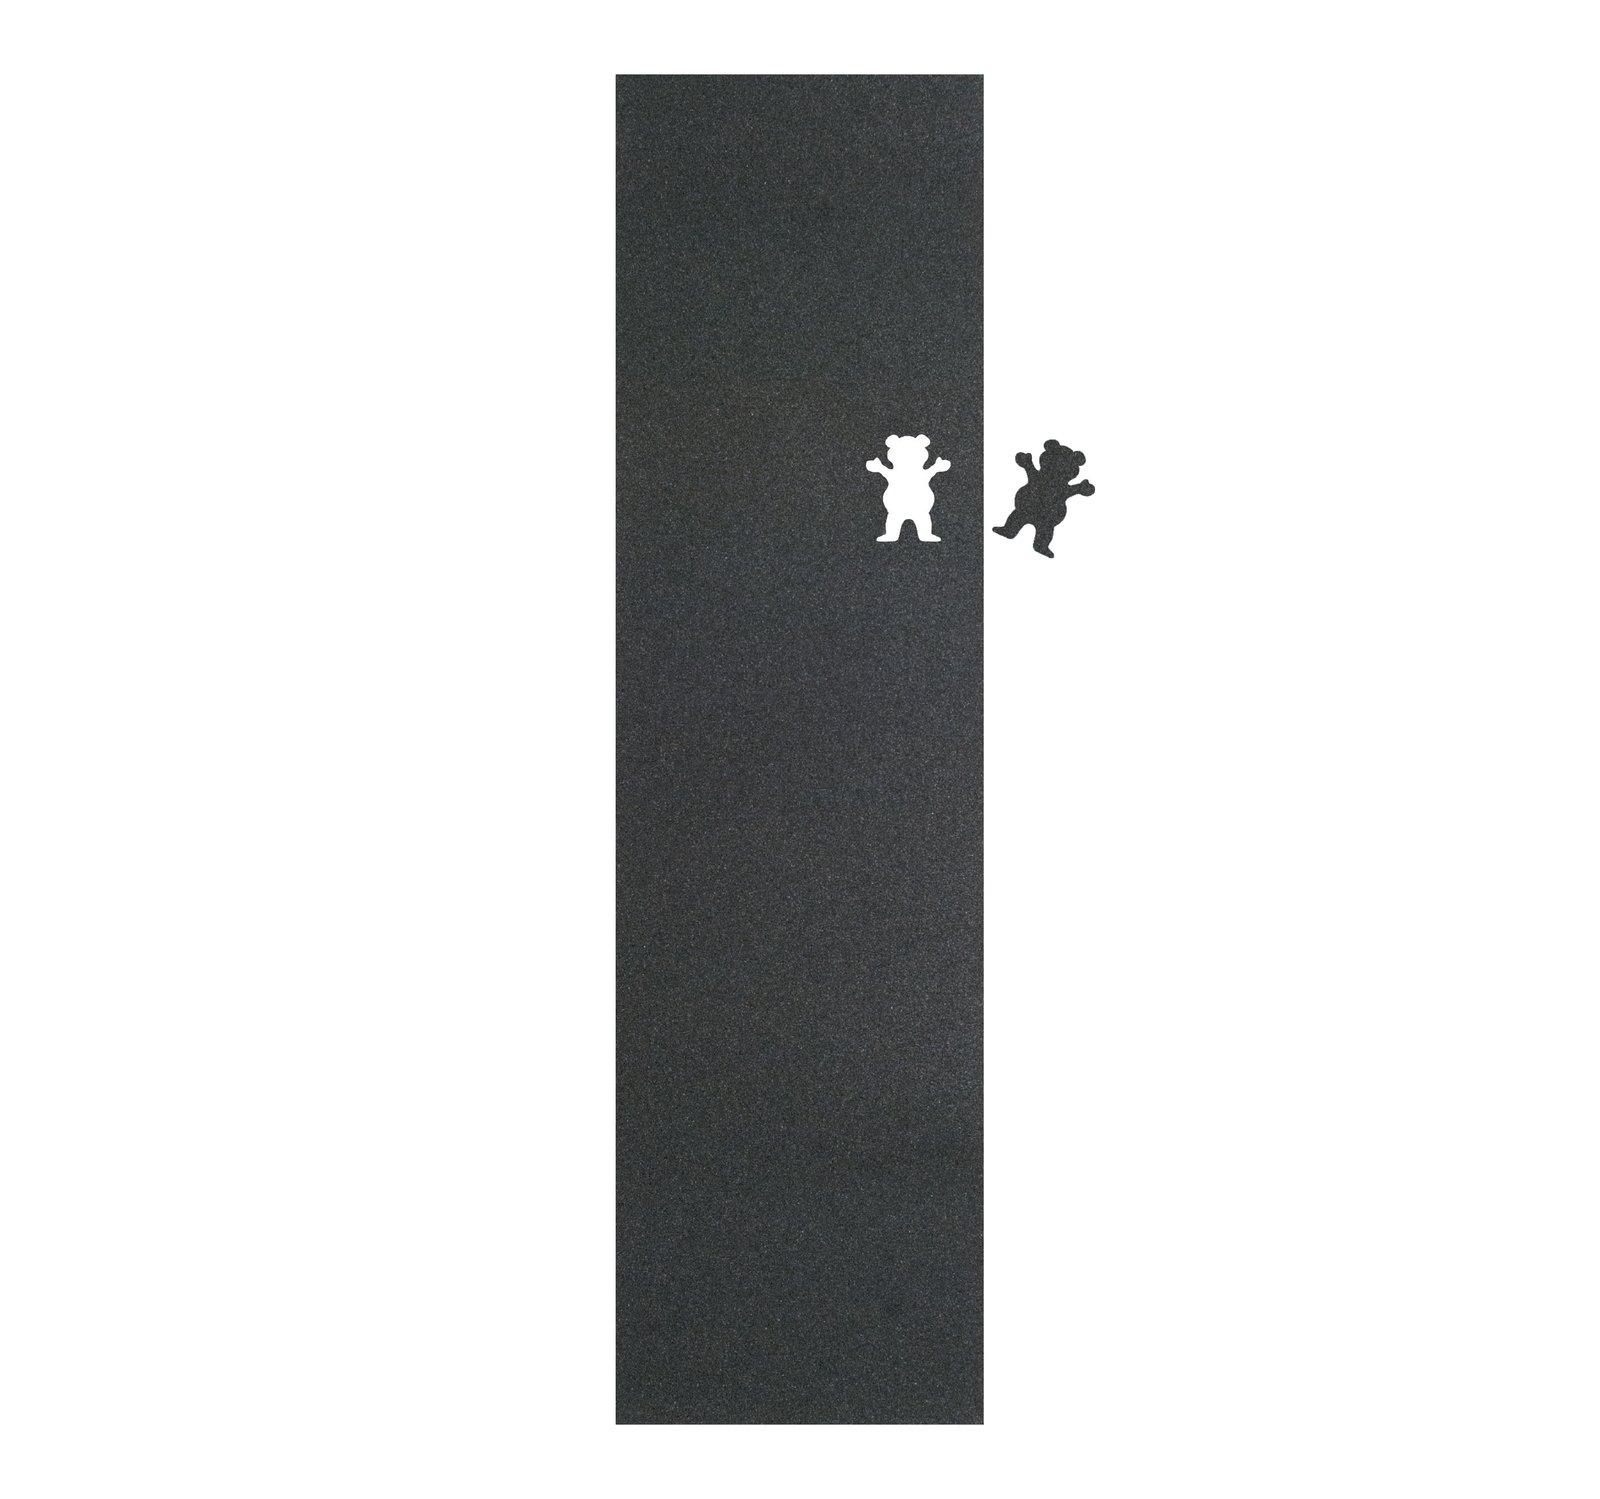 GRZ GRIP BEAR CUTOUT RGULR SHT - Click to enlarge